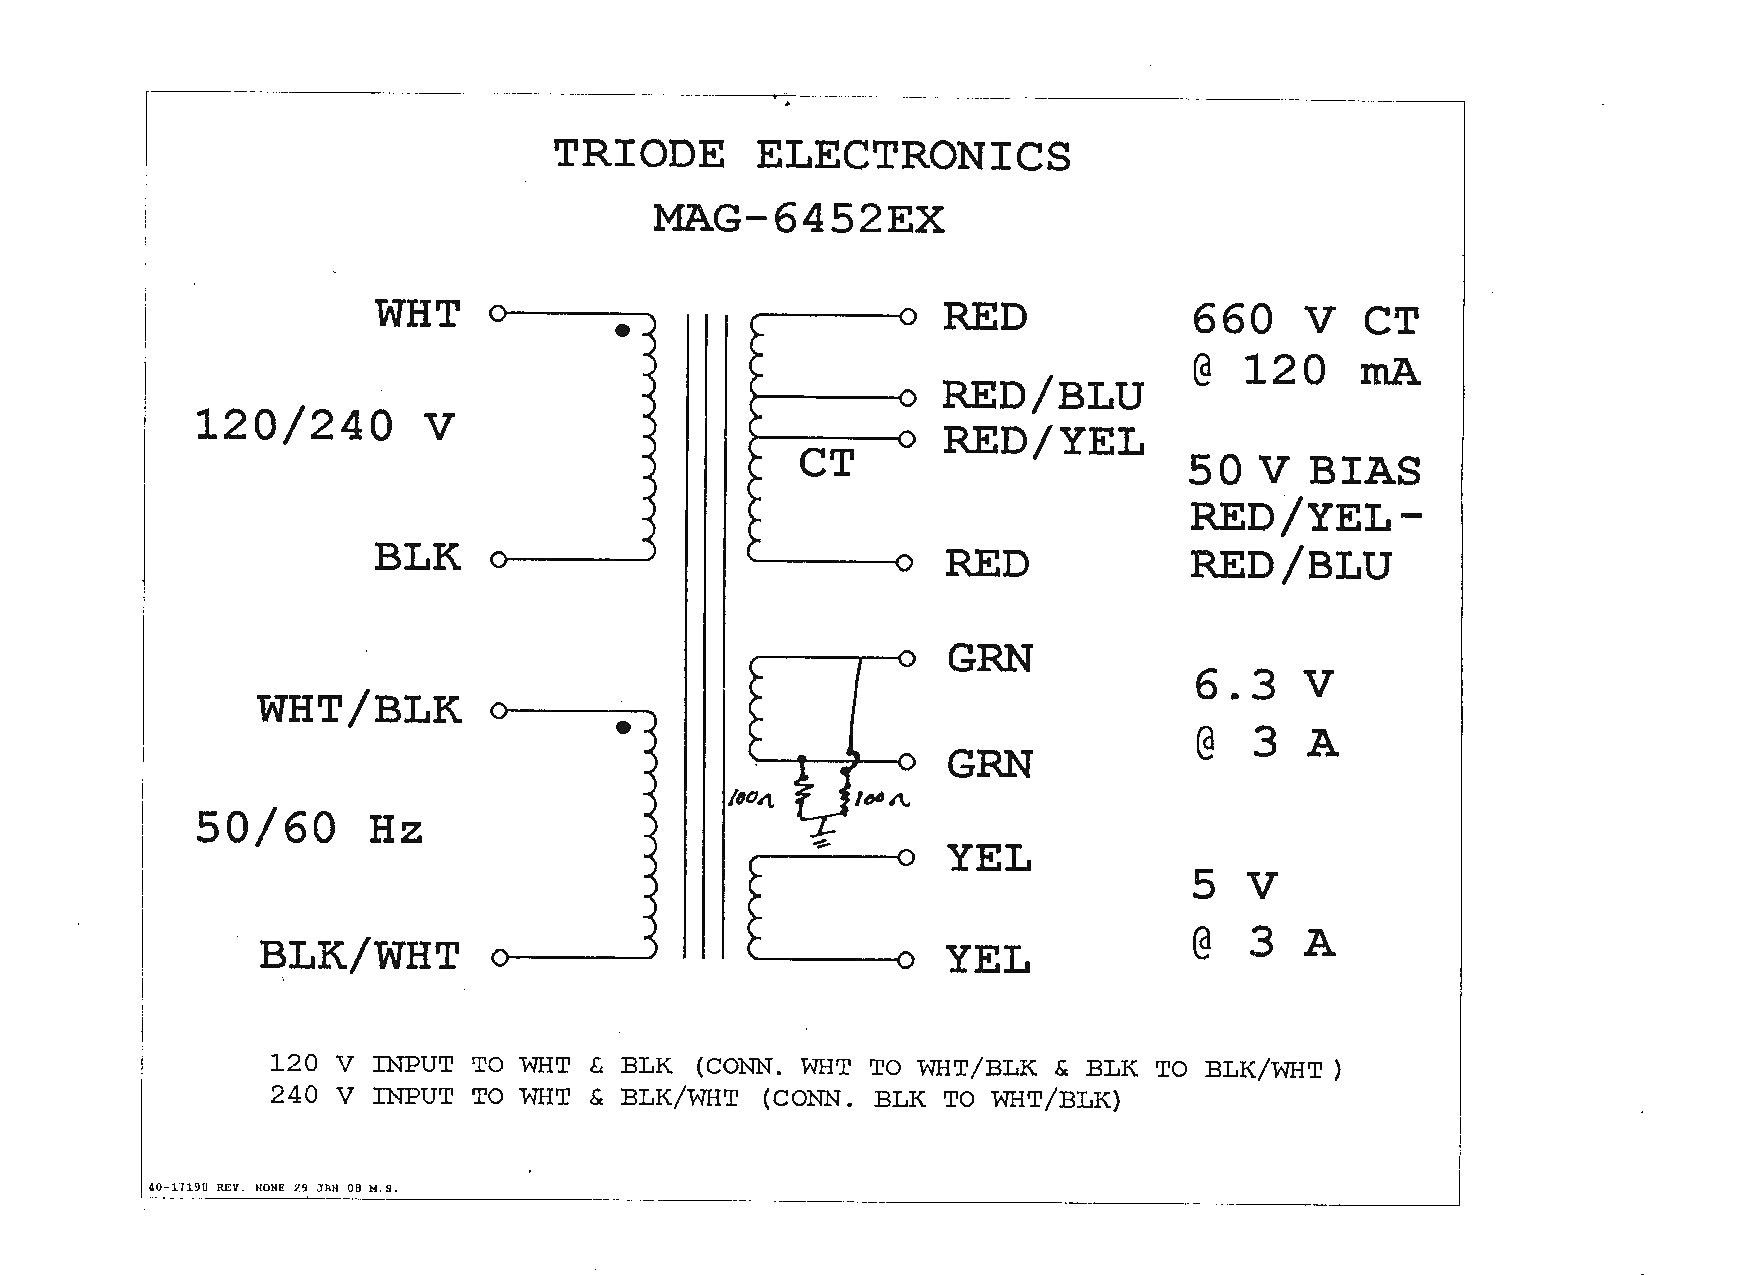 Single Phase Transformer Wiring Diagram In 2020 Transformer Wiring Single Phase Transformer Auto Transformer